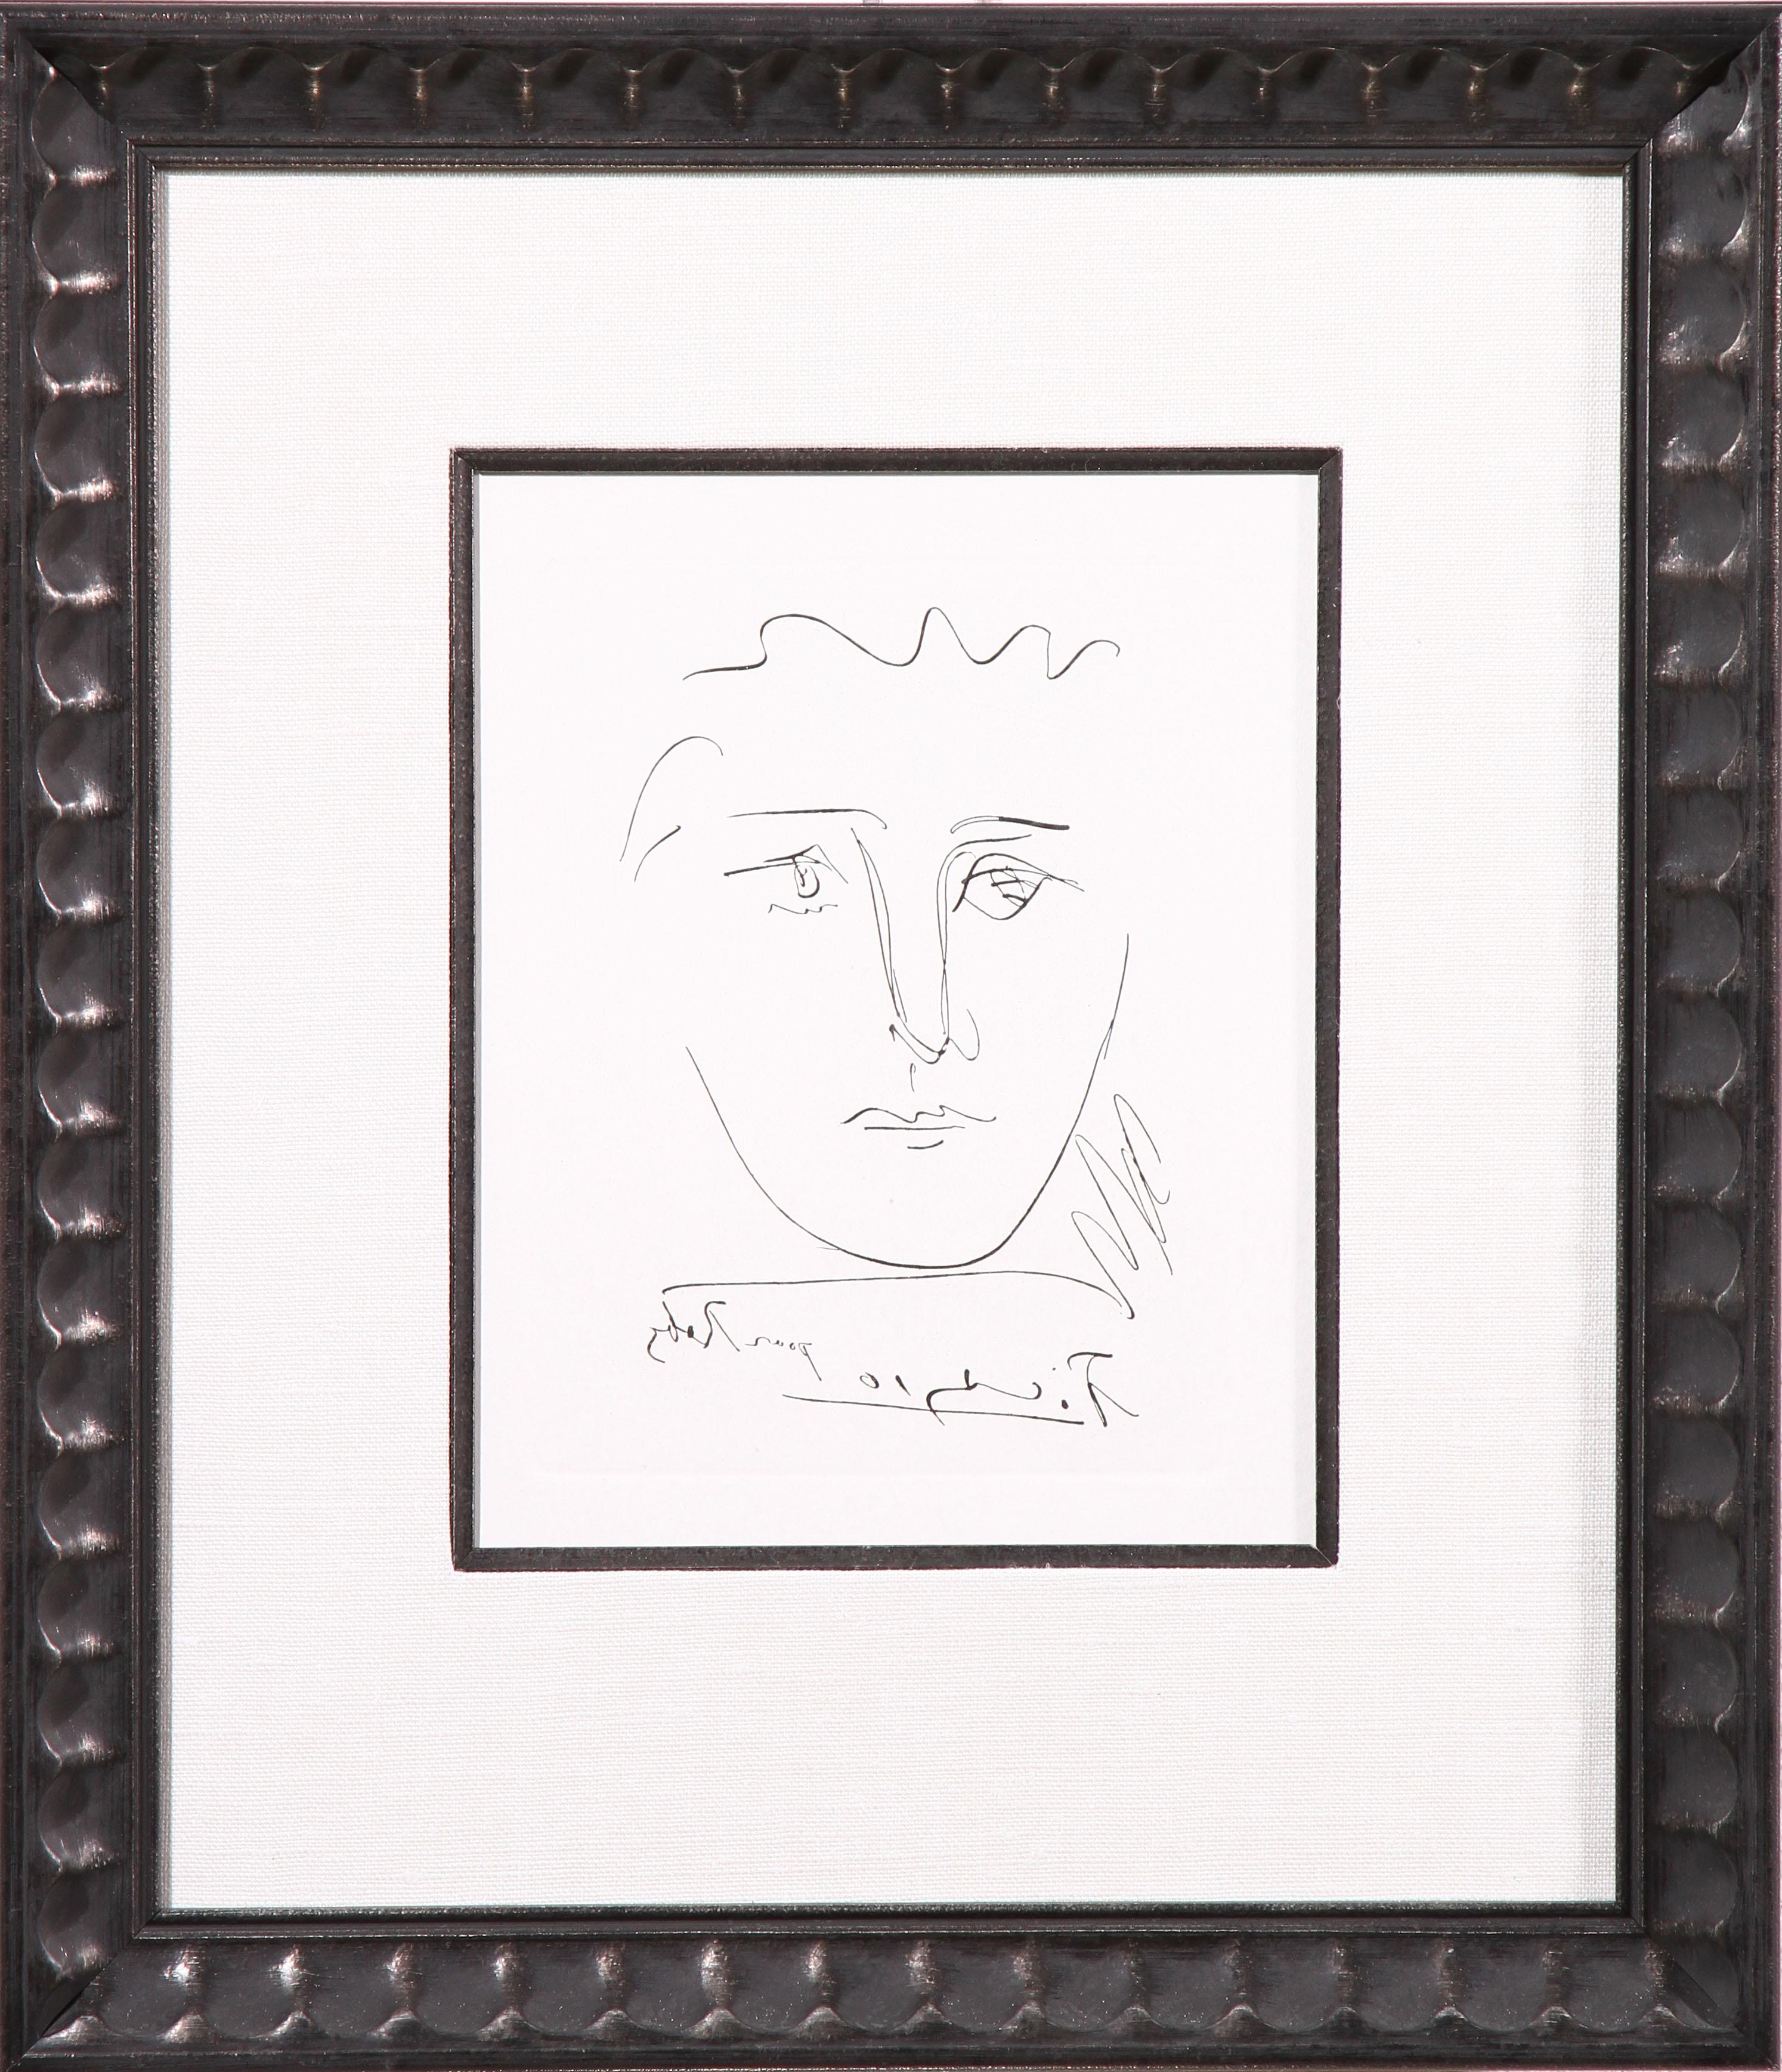 Pour Roby From L\'Age de Soleil by Robert J. Godet - Centaur Art Gallery